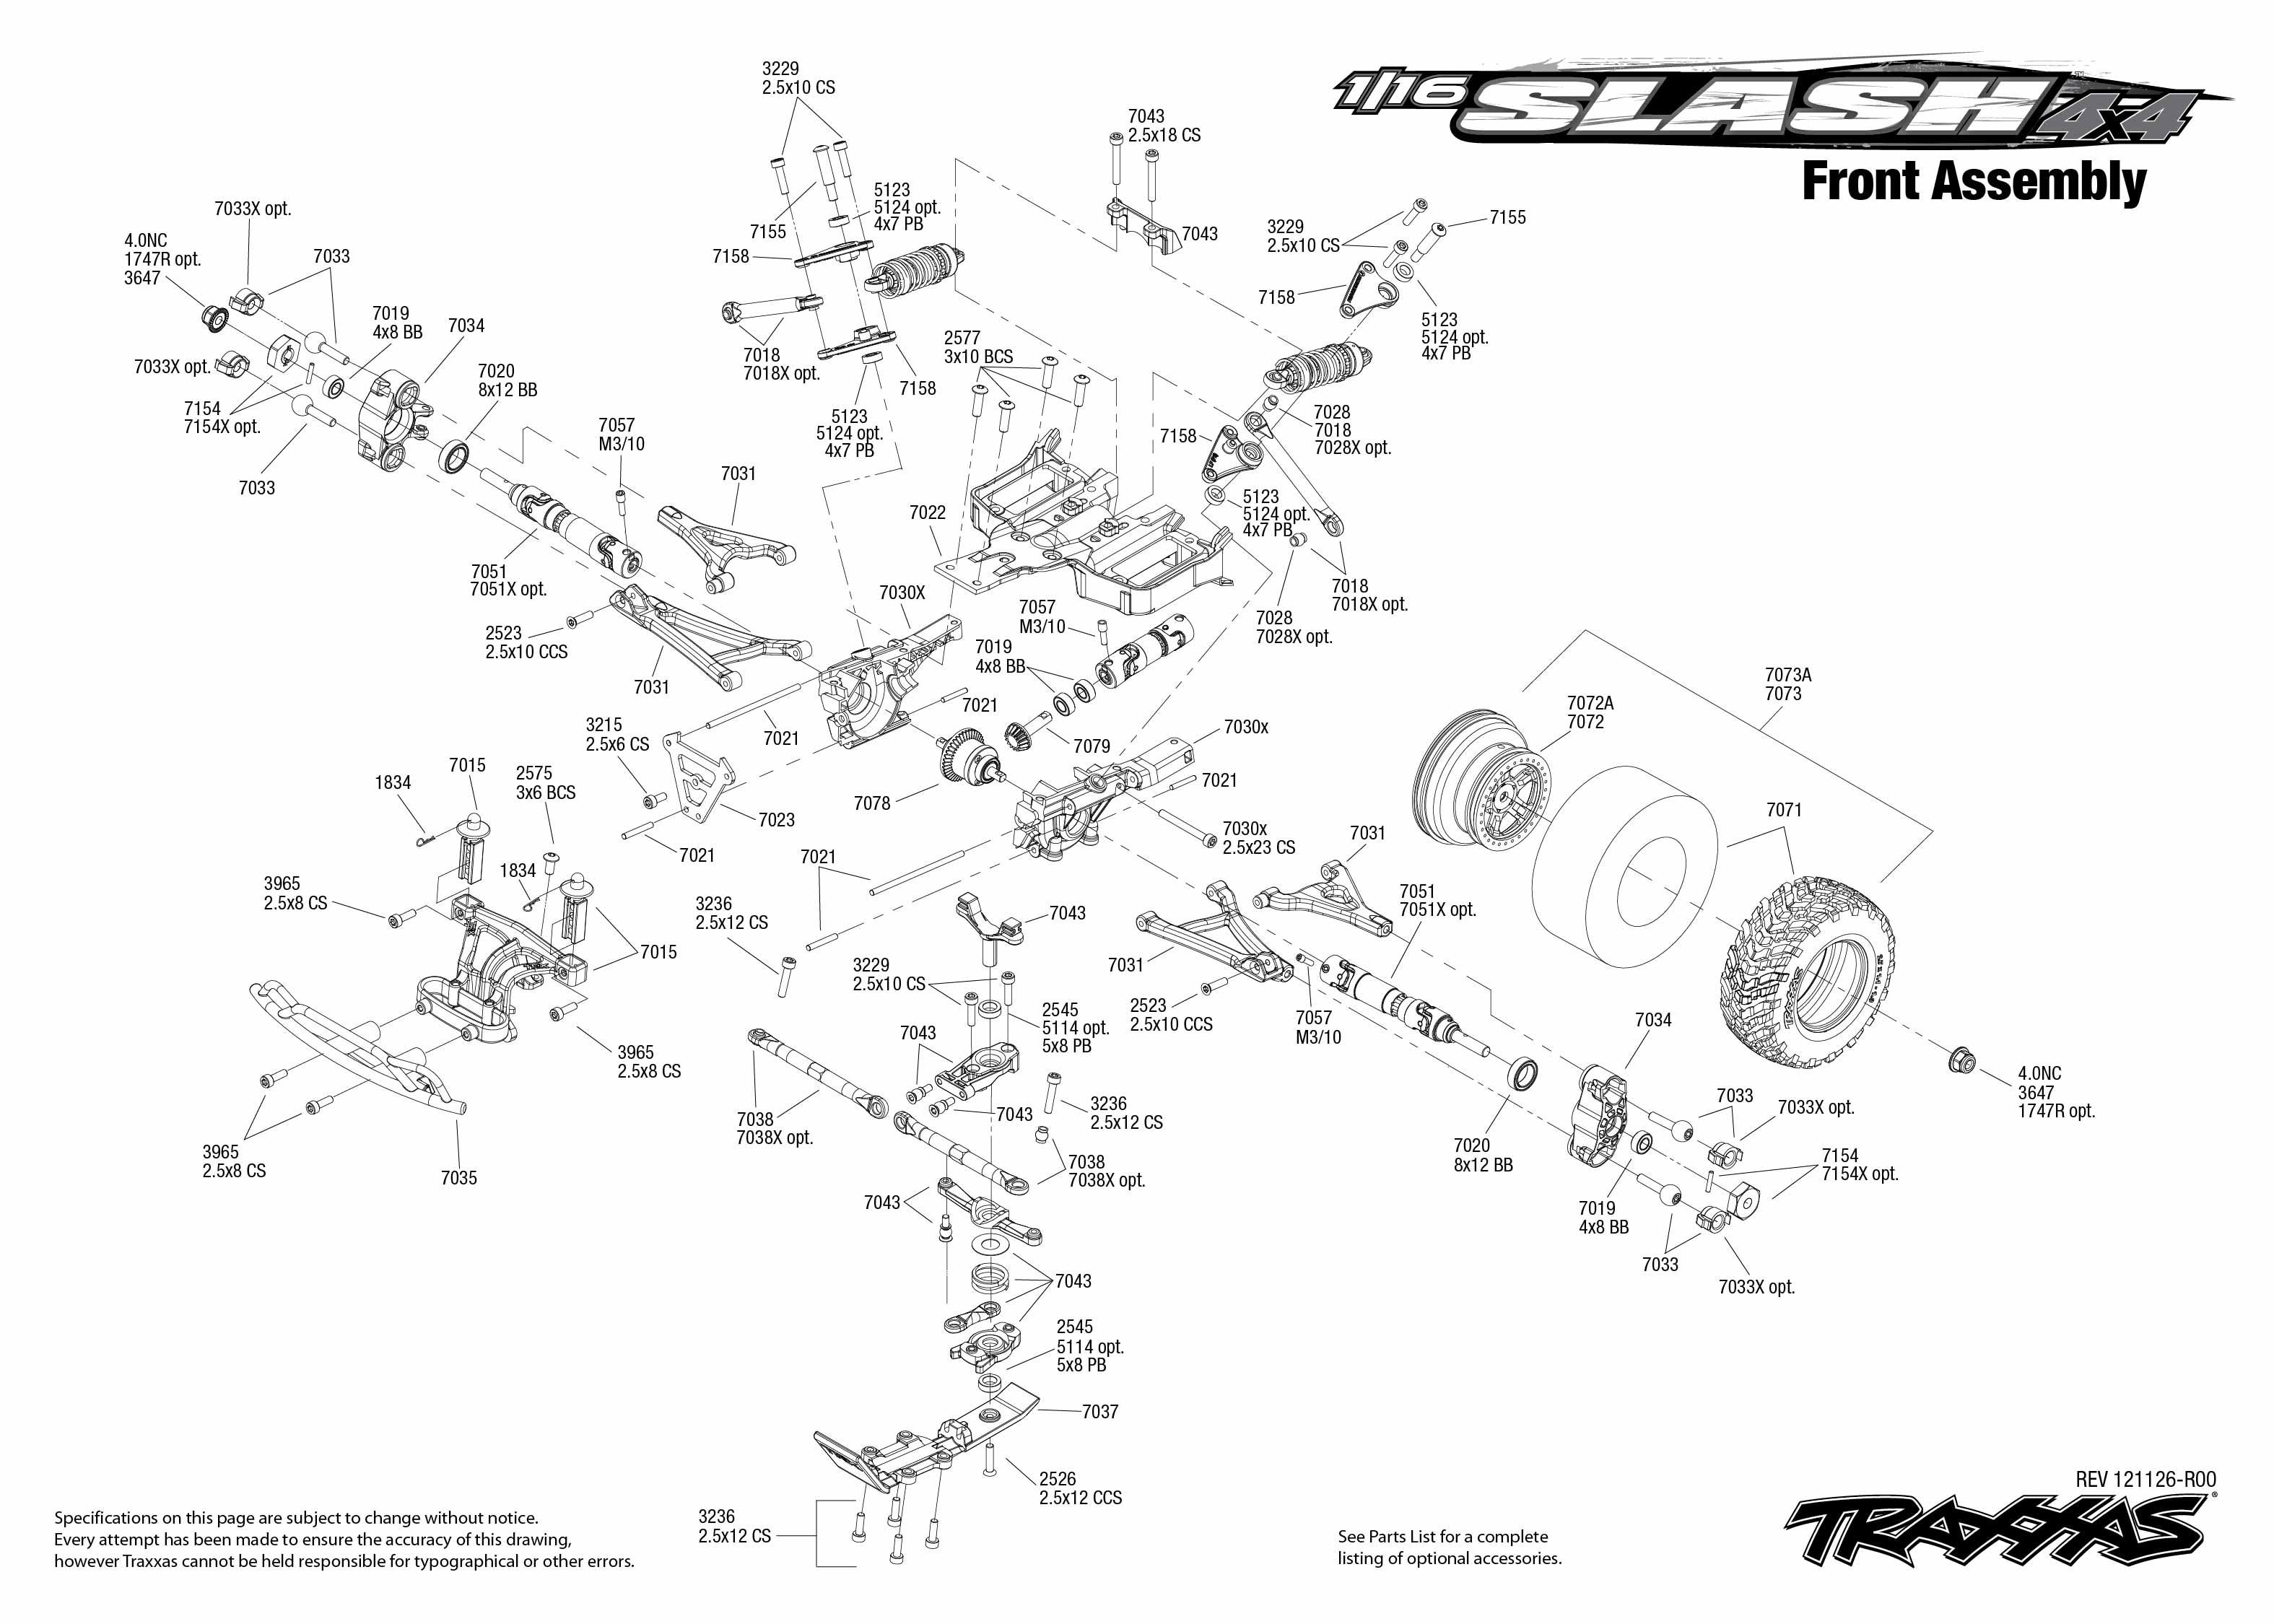 traxxas t maxx 2 5 transmission diagram 2001 ford f250 radio wiring slash 4x4 parts html - imageresizertool.com